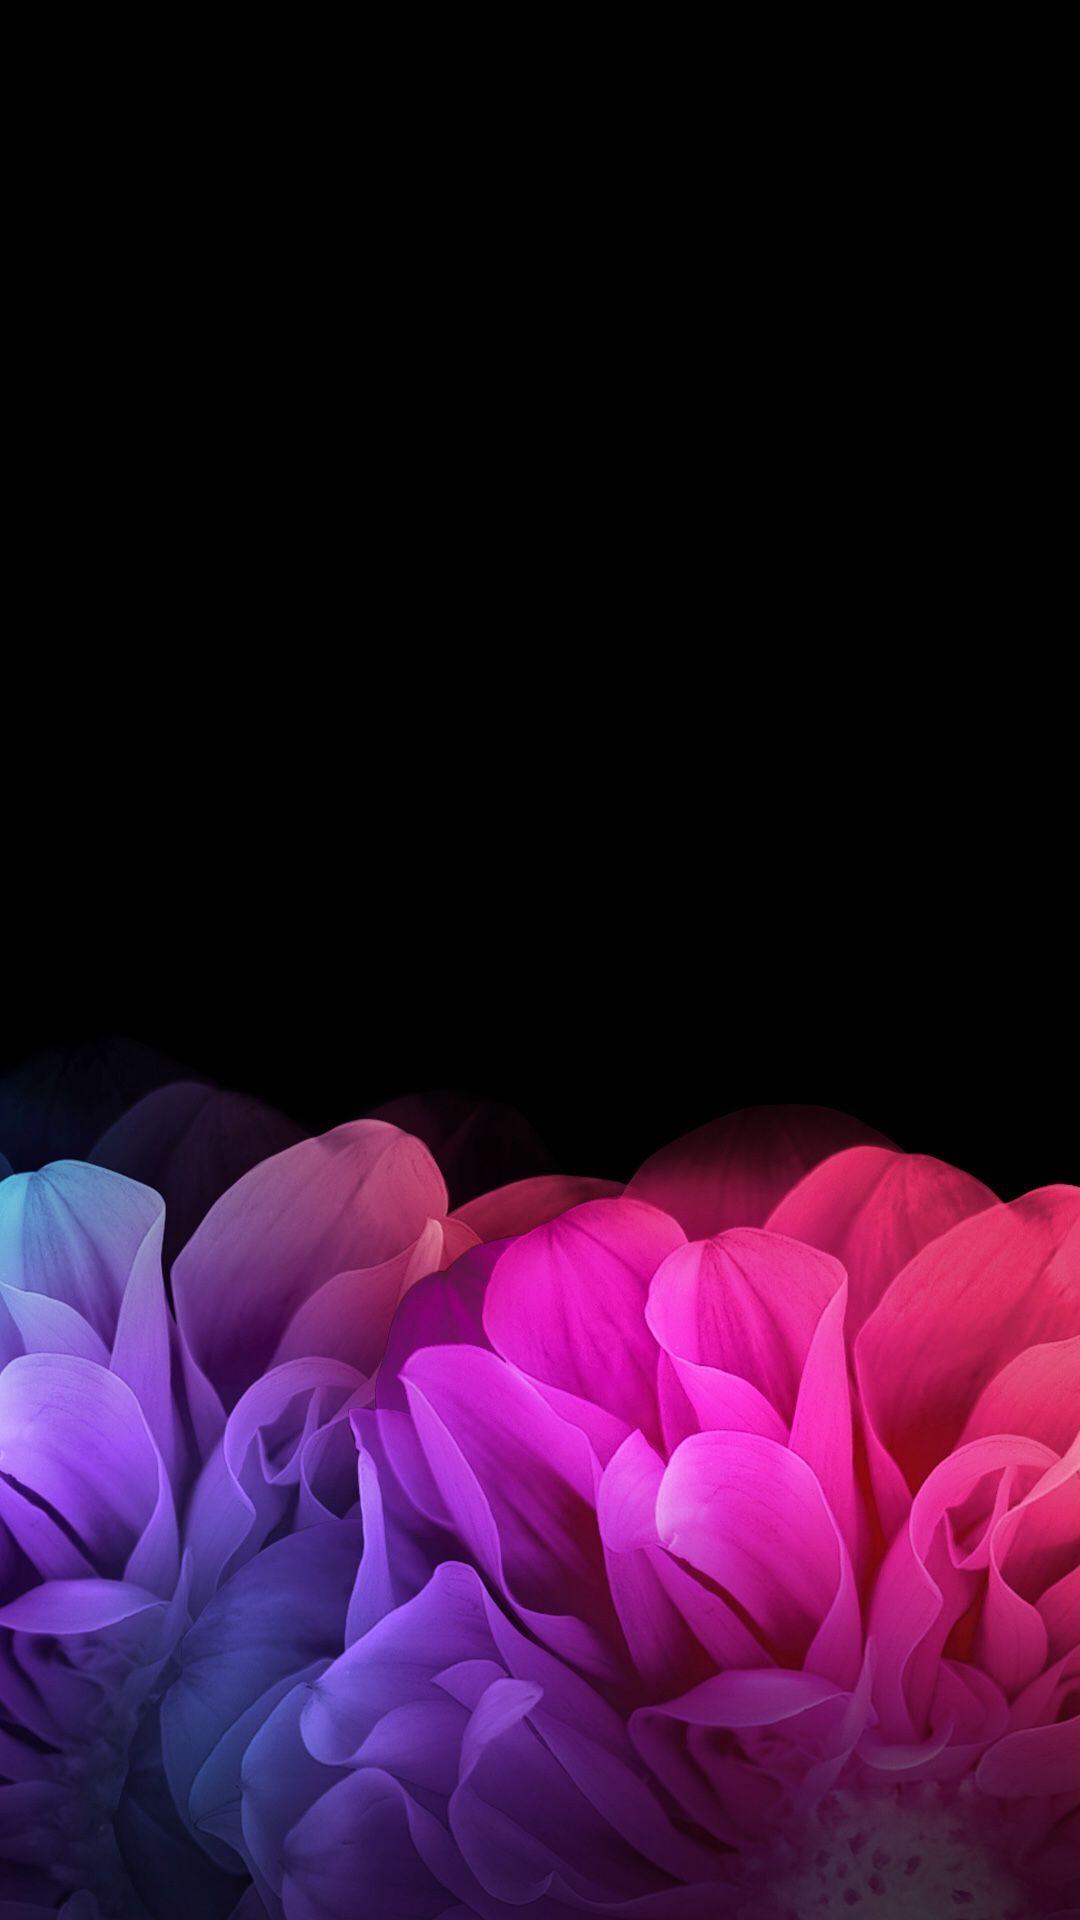 Black Floral Iphone Wallpaper - Iphone Dark Flower Backgrounds - HD Wallpaper